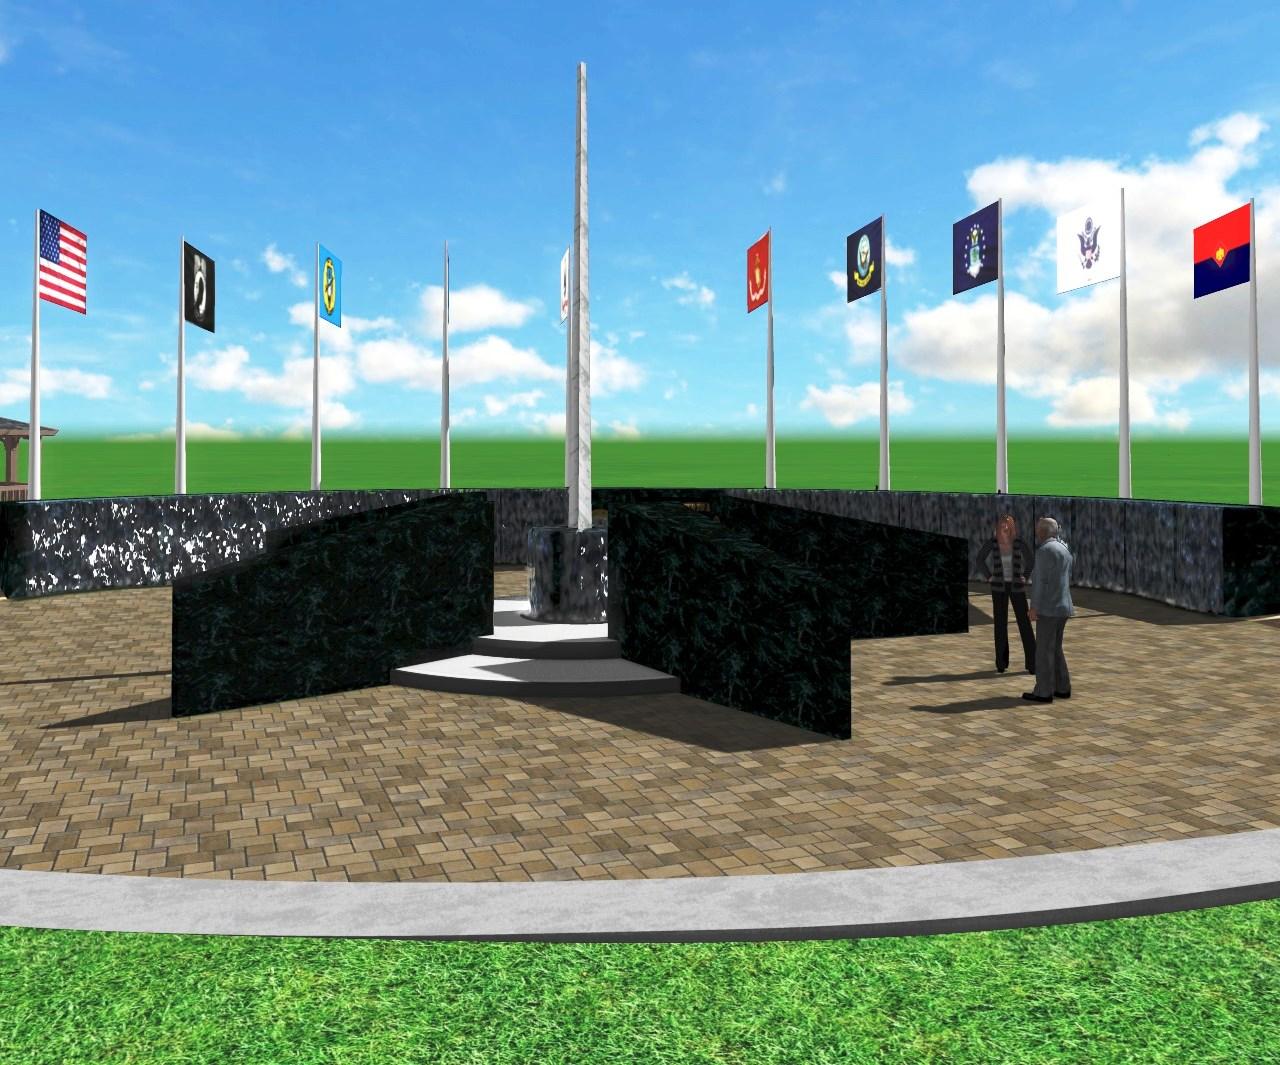 Osage Congress OKs memorial name change to Osage Veterans Memorial